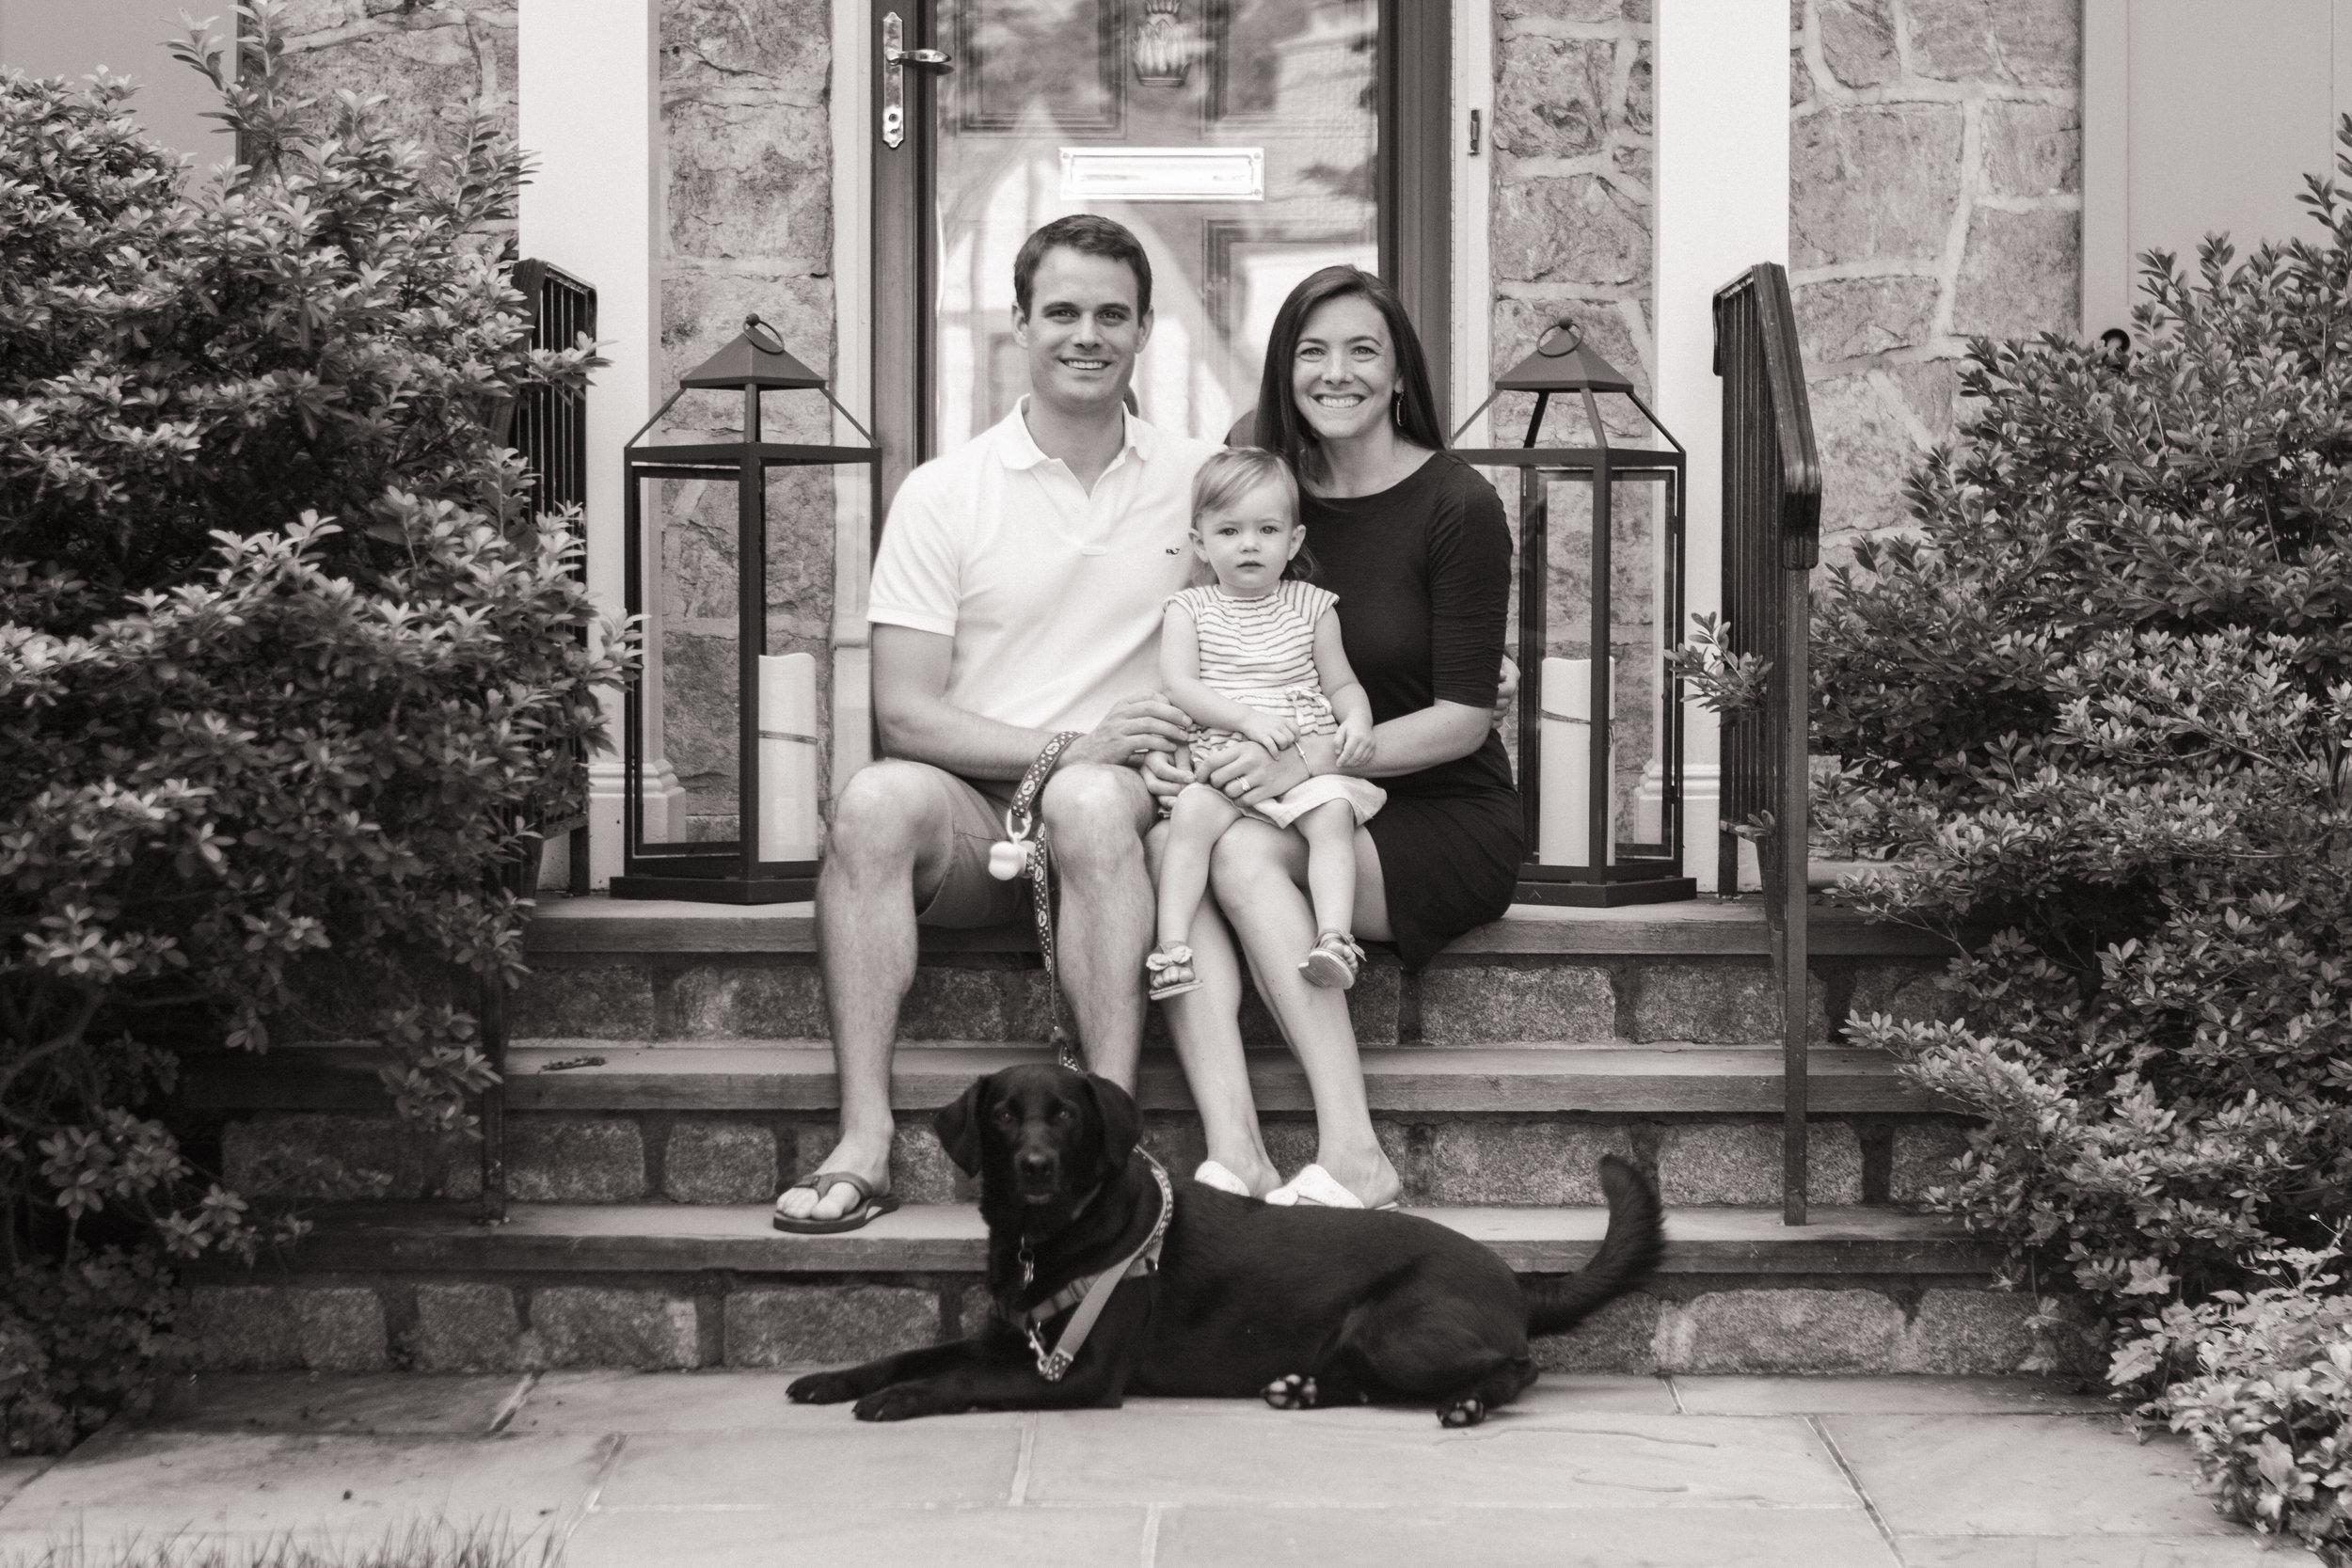 2018-08-10 Pollakowski Family Shannon Sorensen Photography-9.jpg